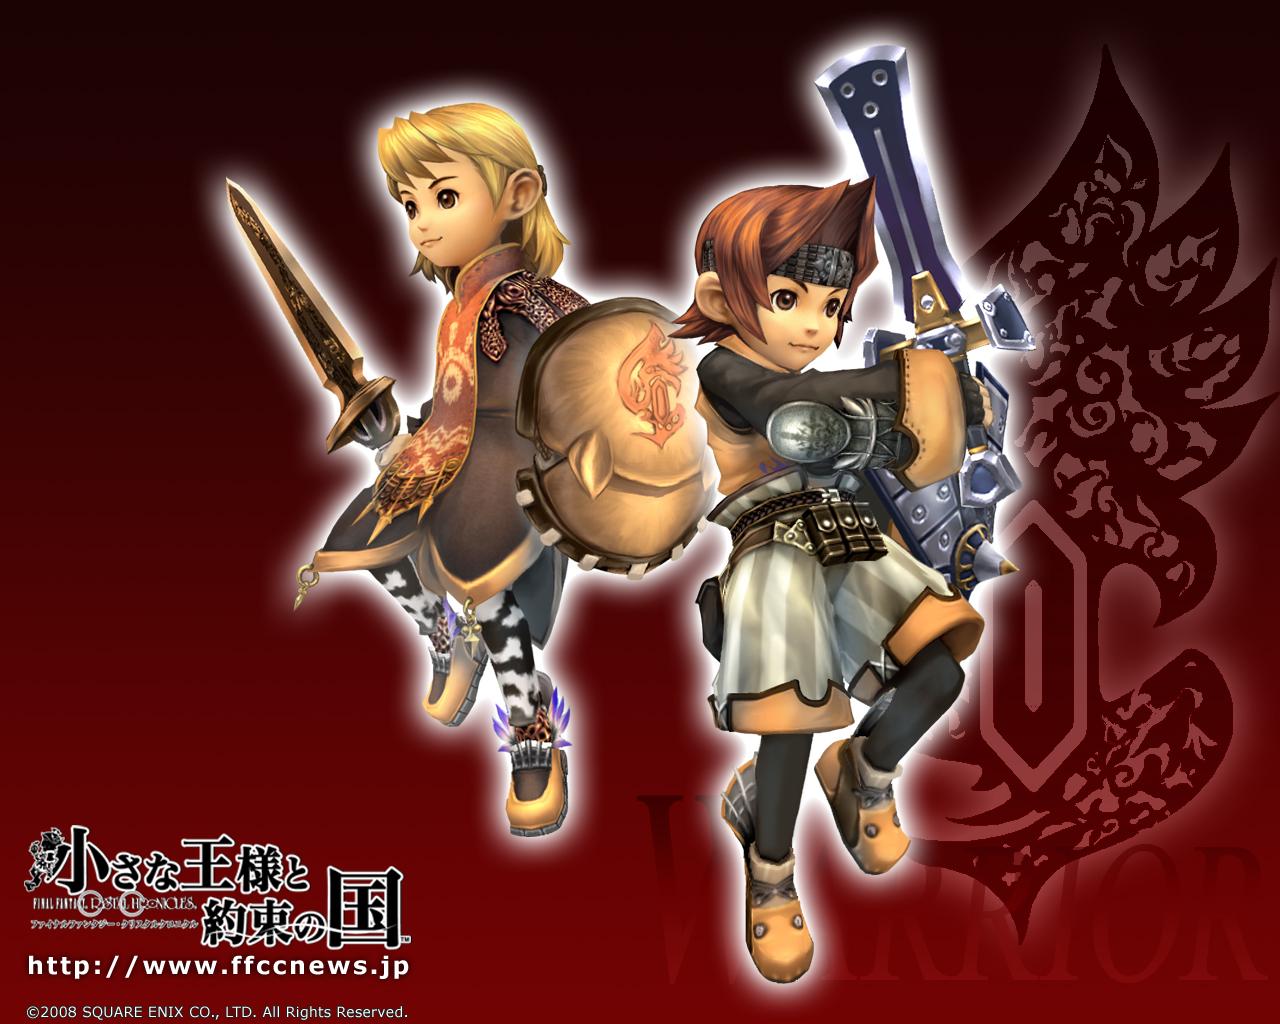 Wallpaper Final Fantasy Final Fantasy Crystal Chronicles Games